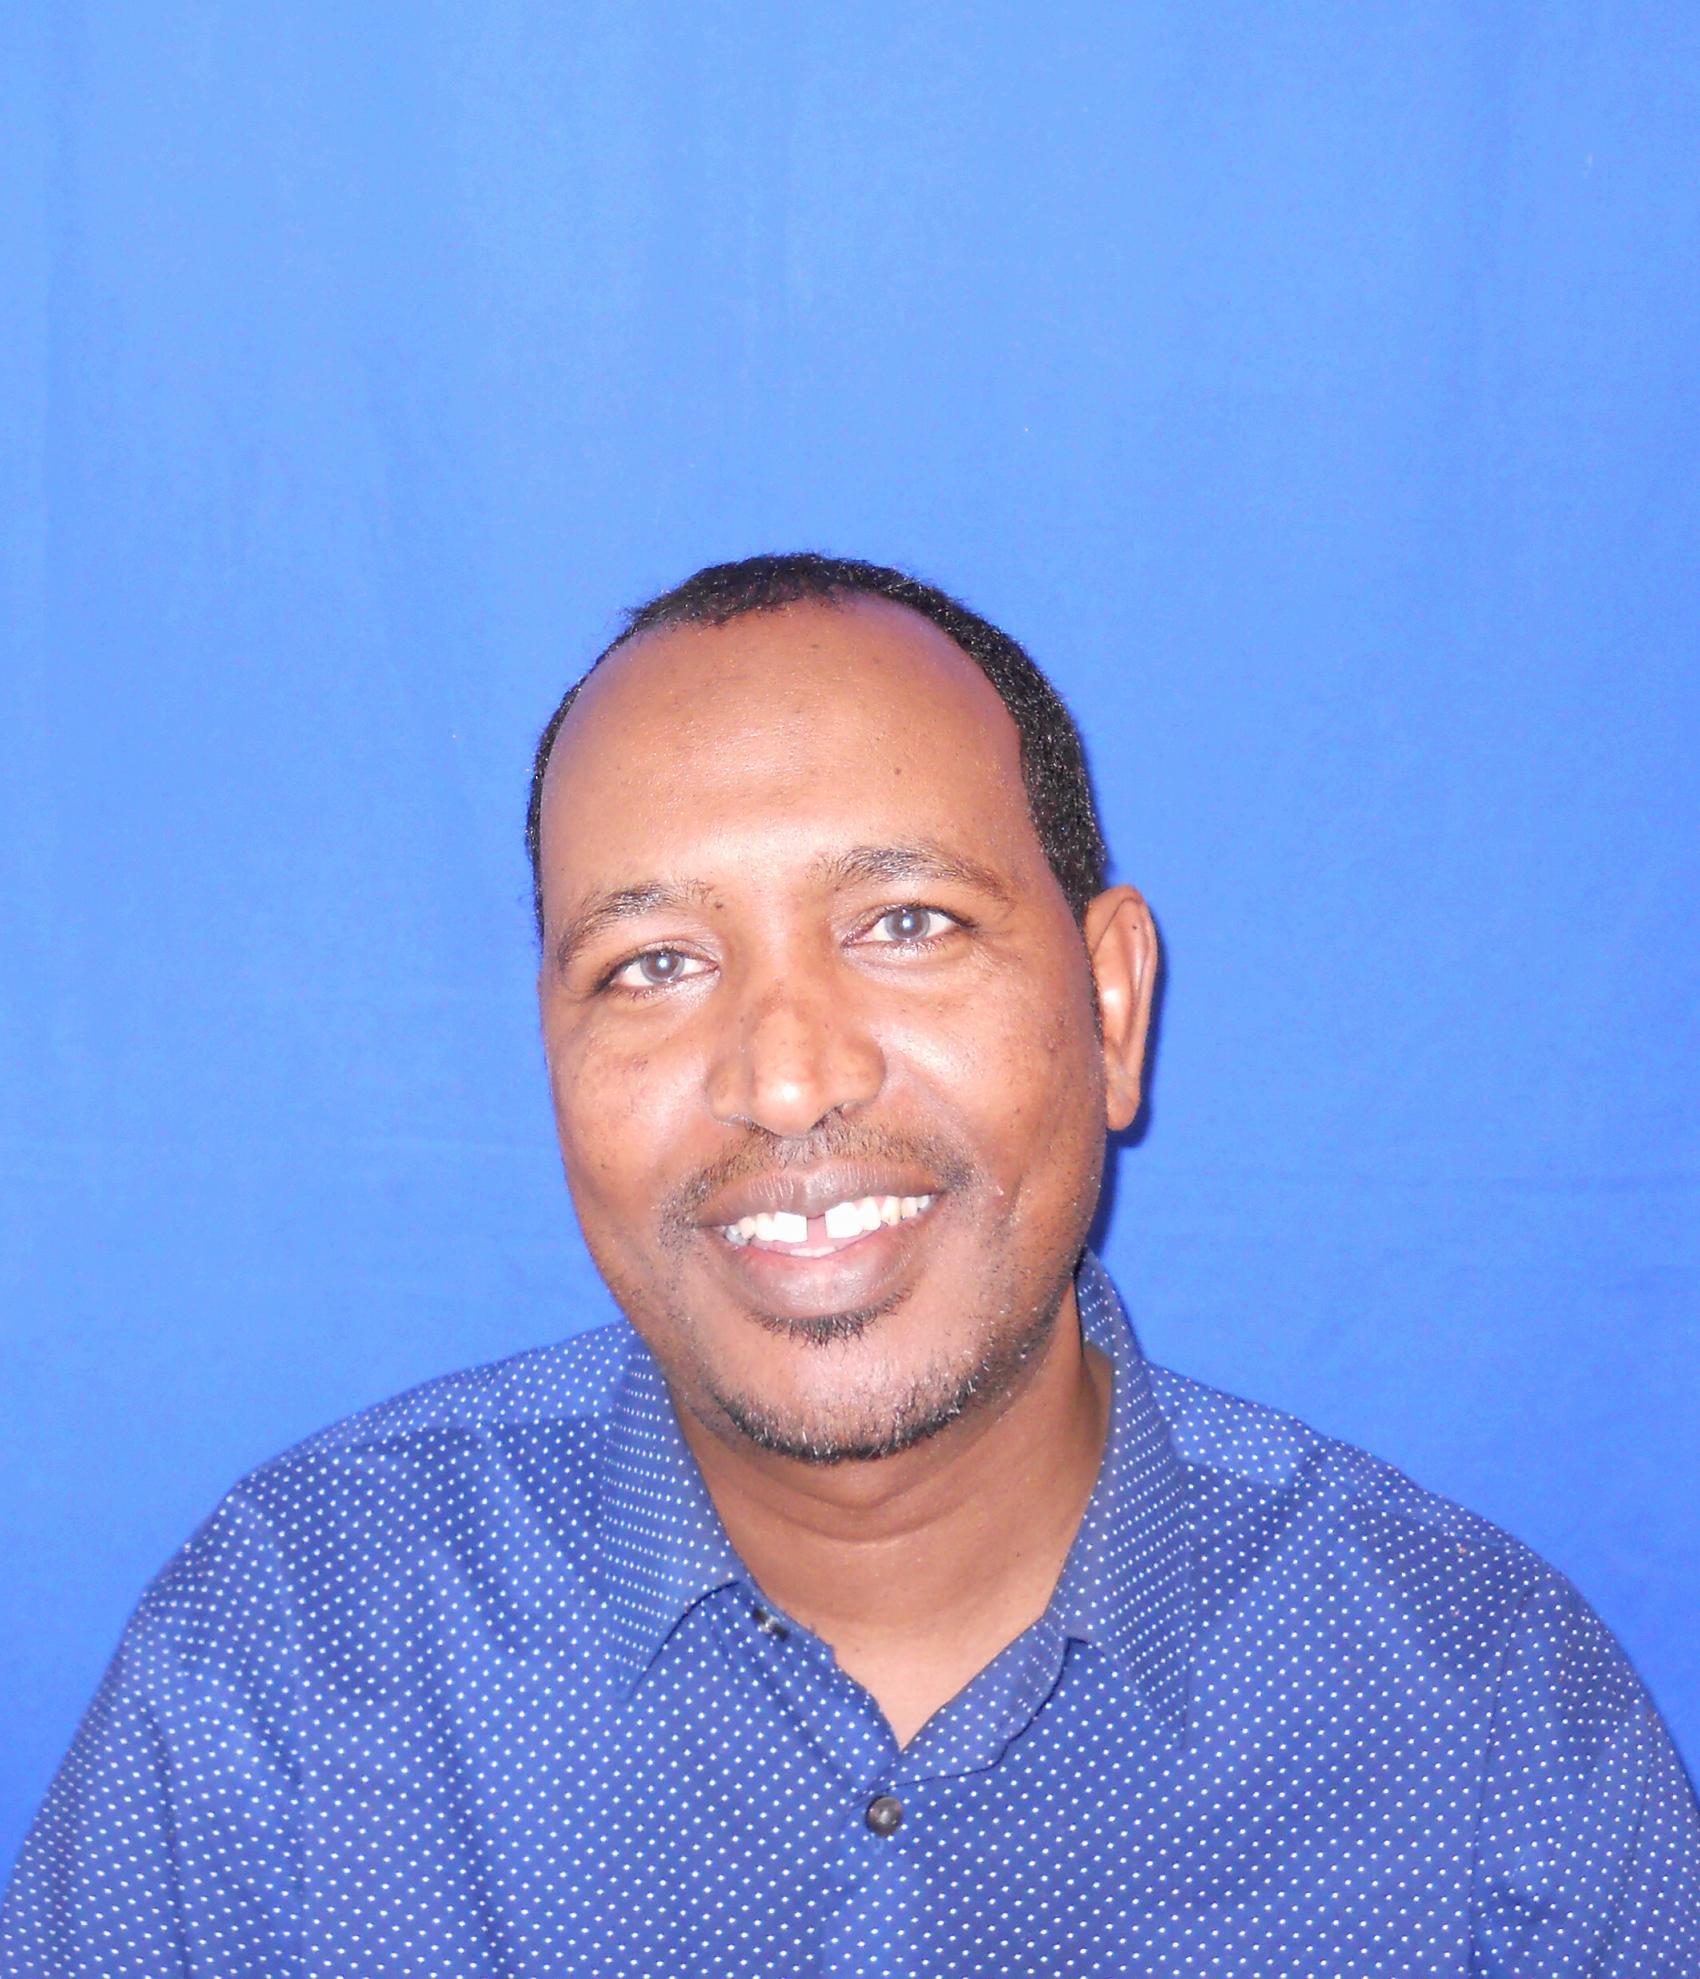 photo of OSMAN AHMED